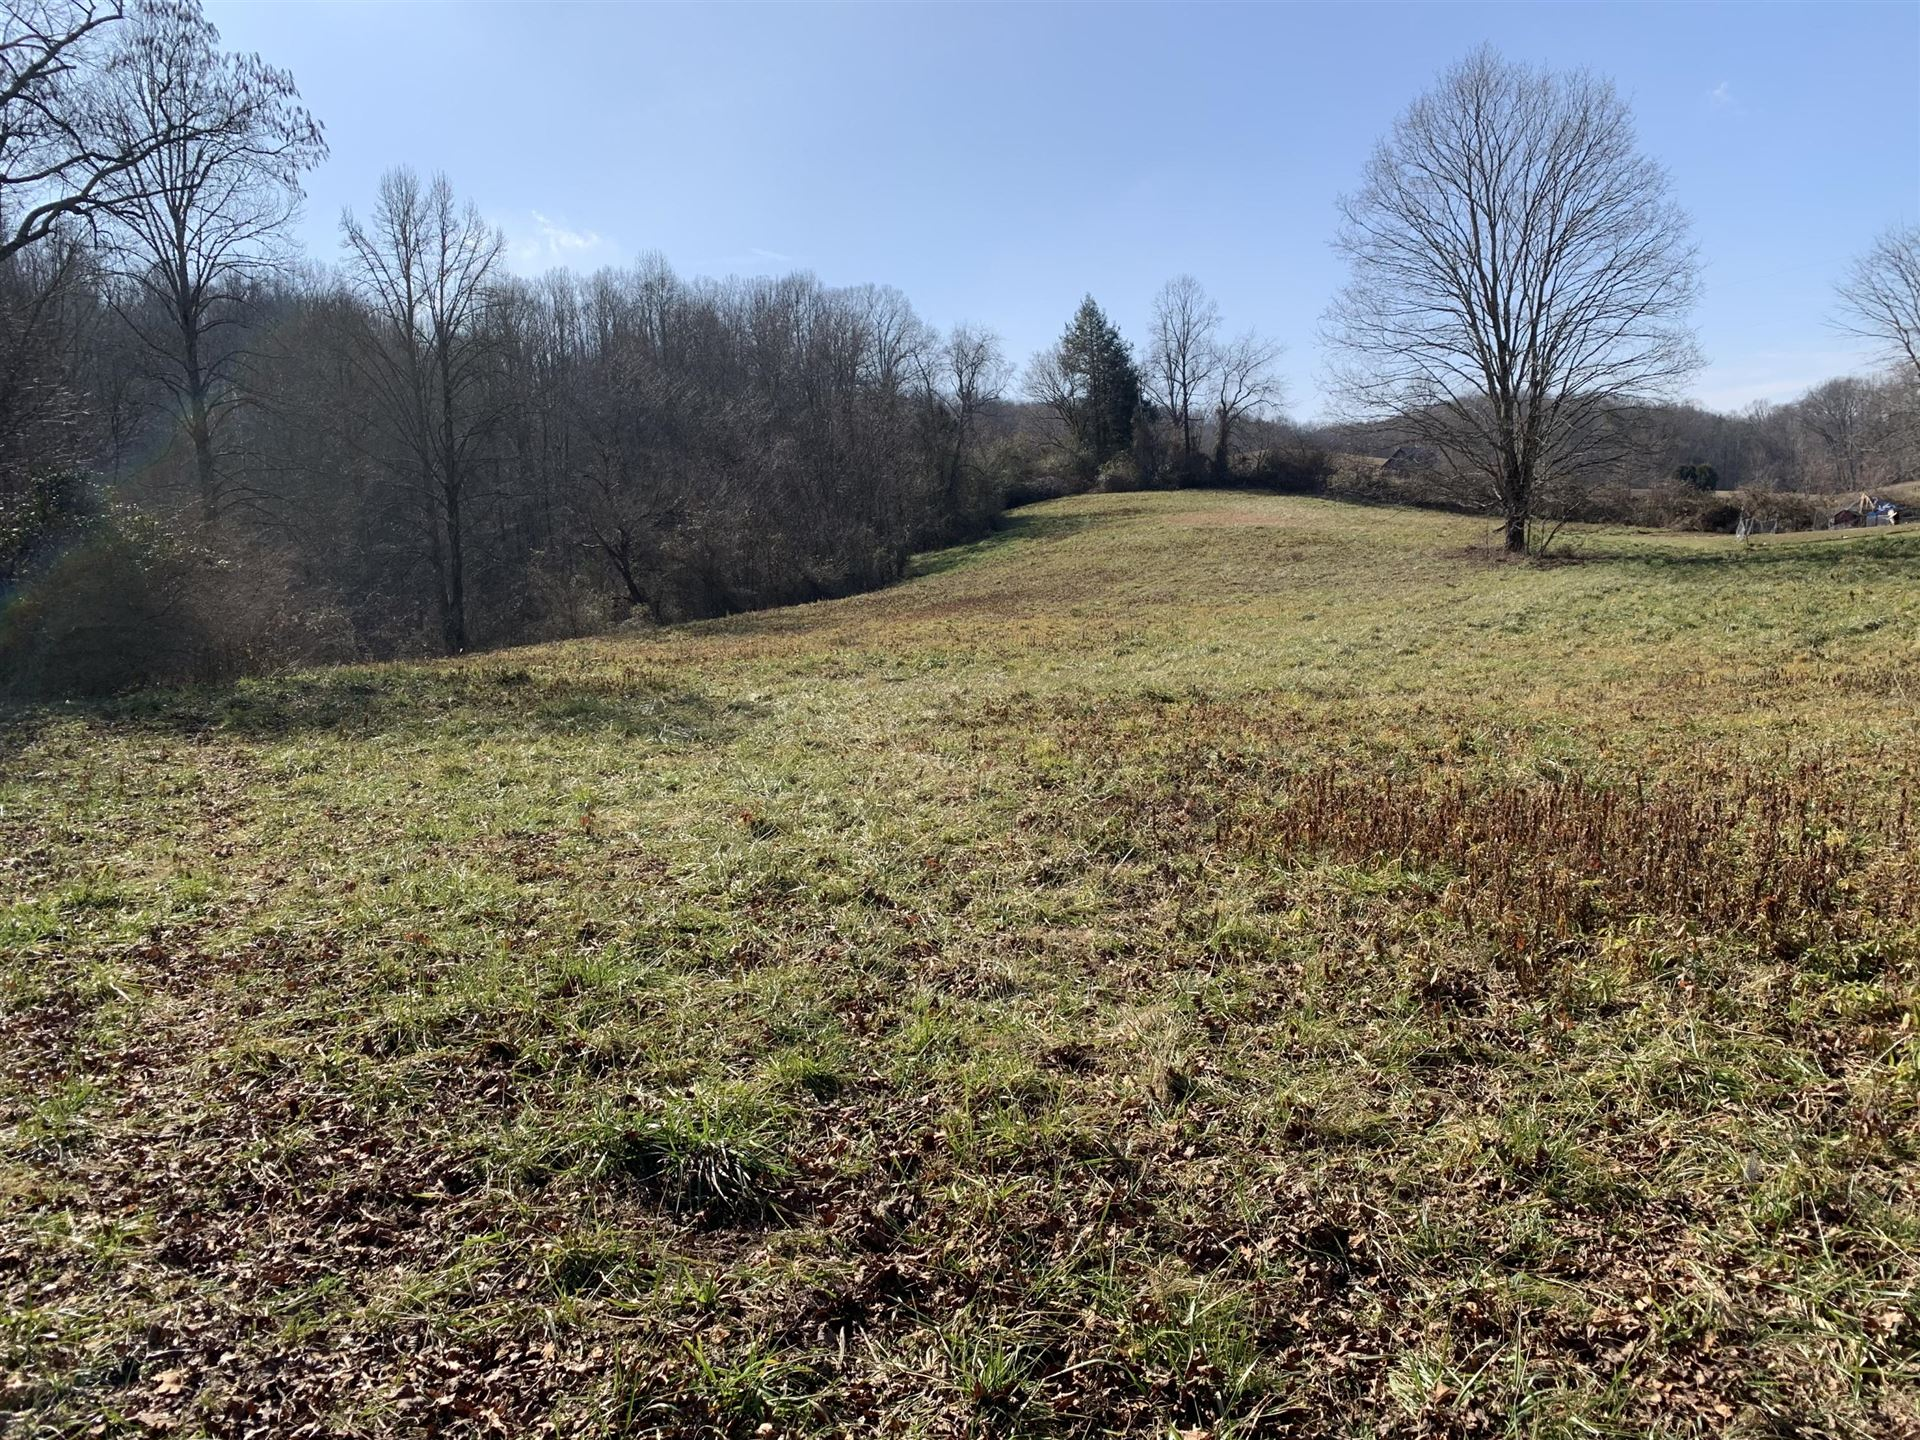 Photo of 240 McMurray Rd, Cumberland Gap, TN 37724 (MLS # 1140105)